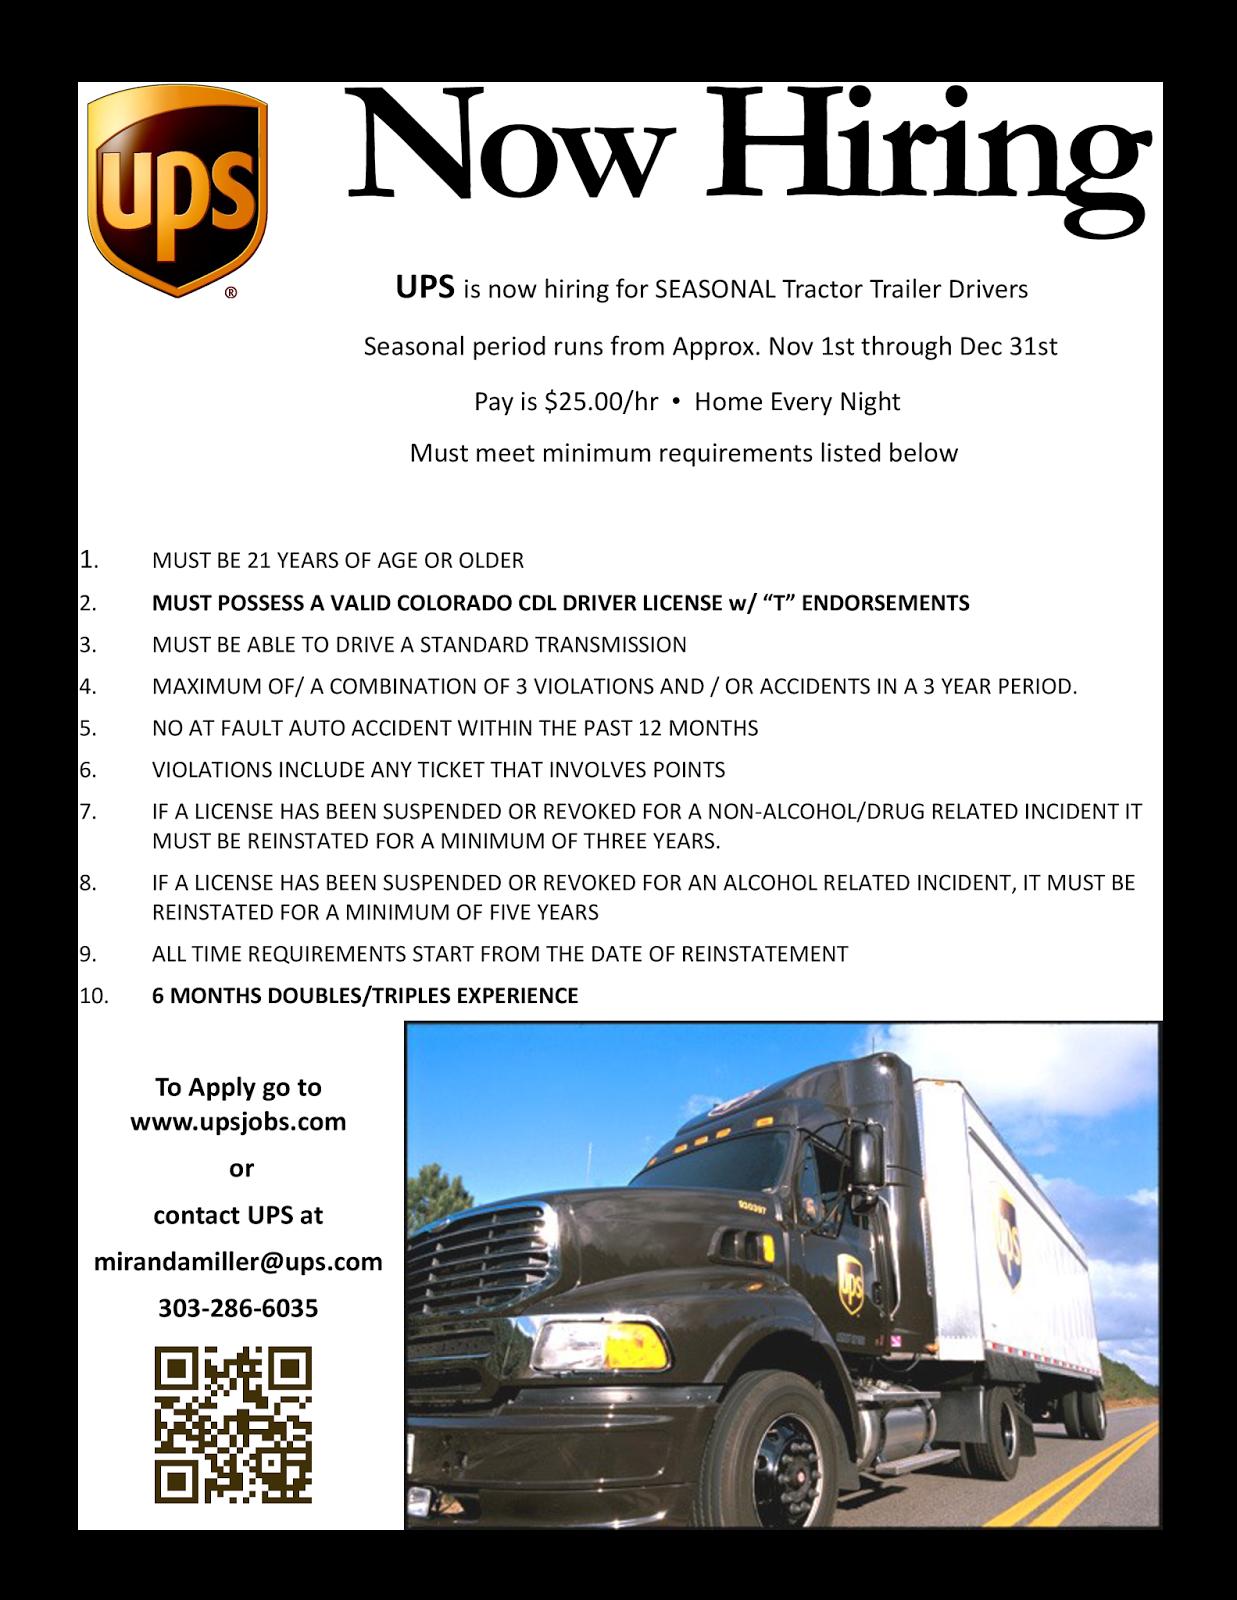 http://safetyasaservice.com, CDL Drivers, Hiring, Truck Drivers, Denver, CO